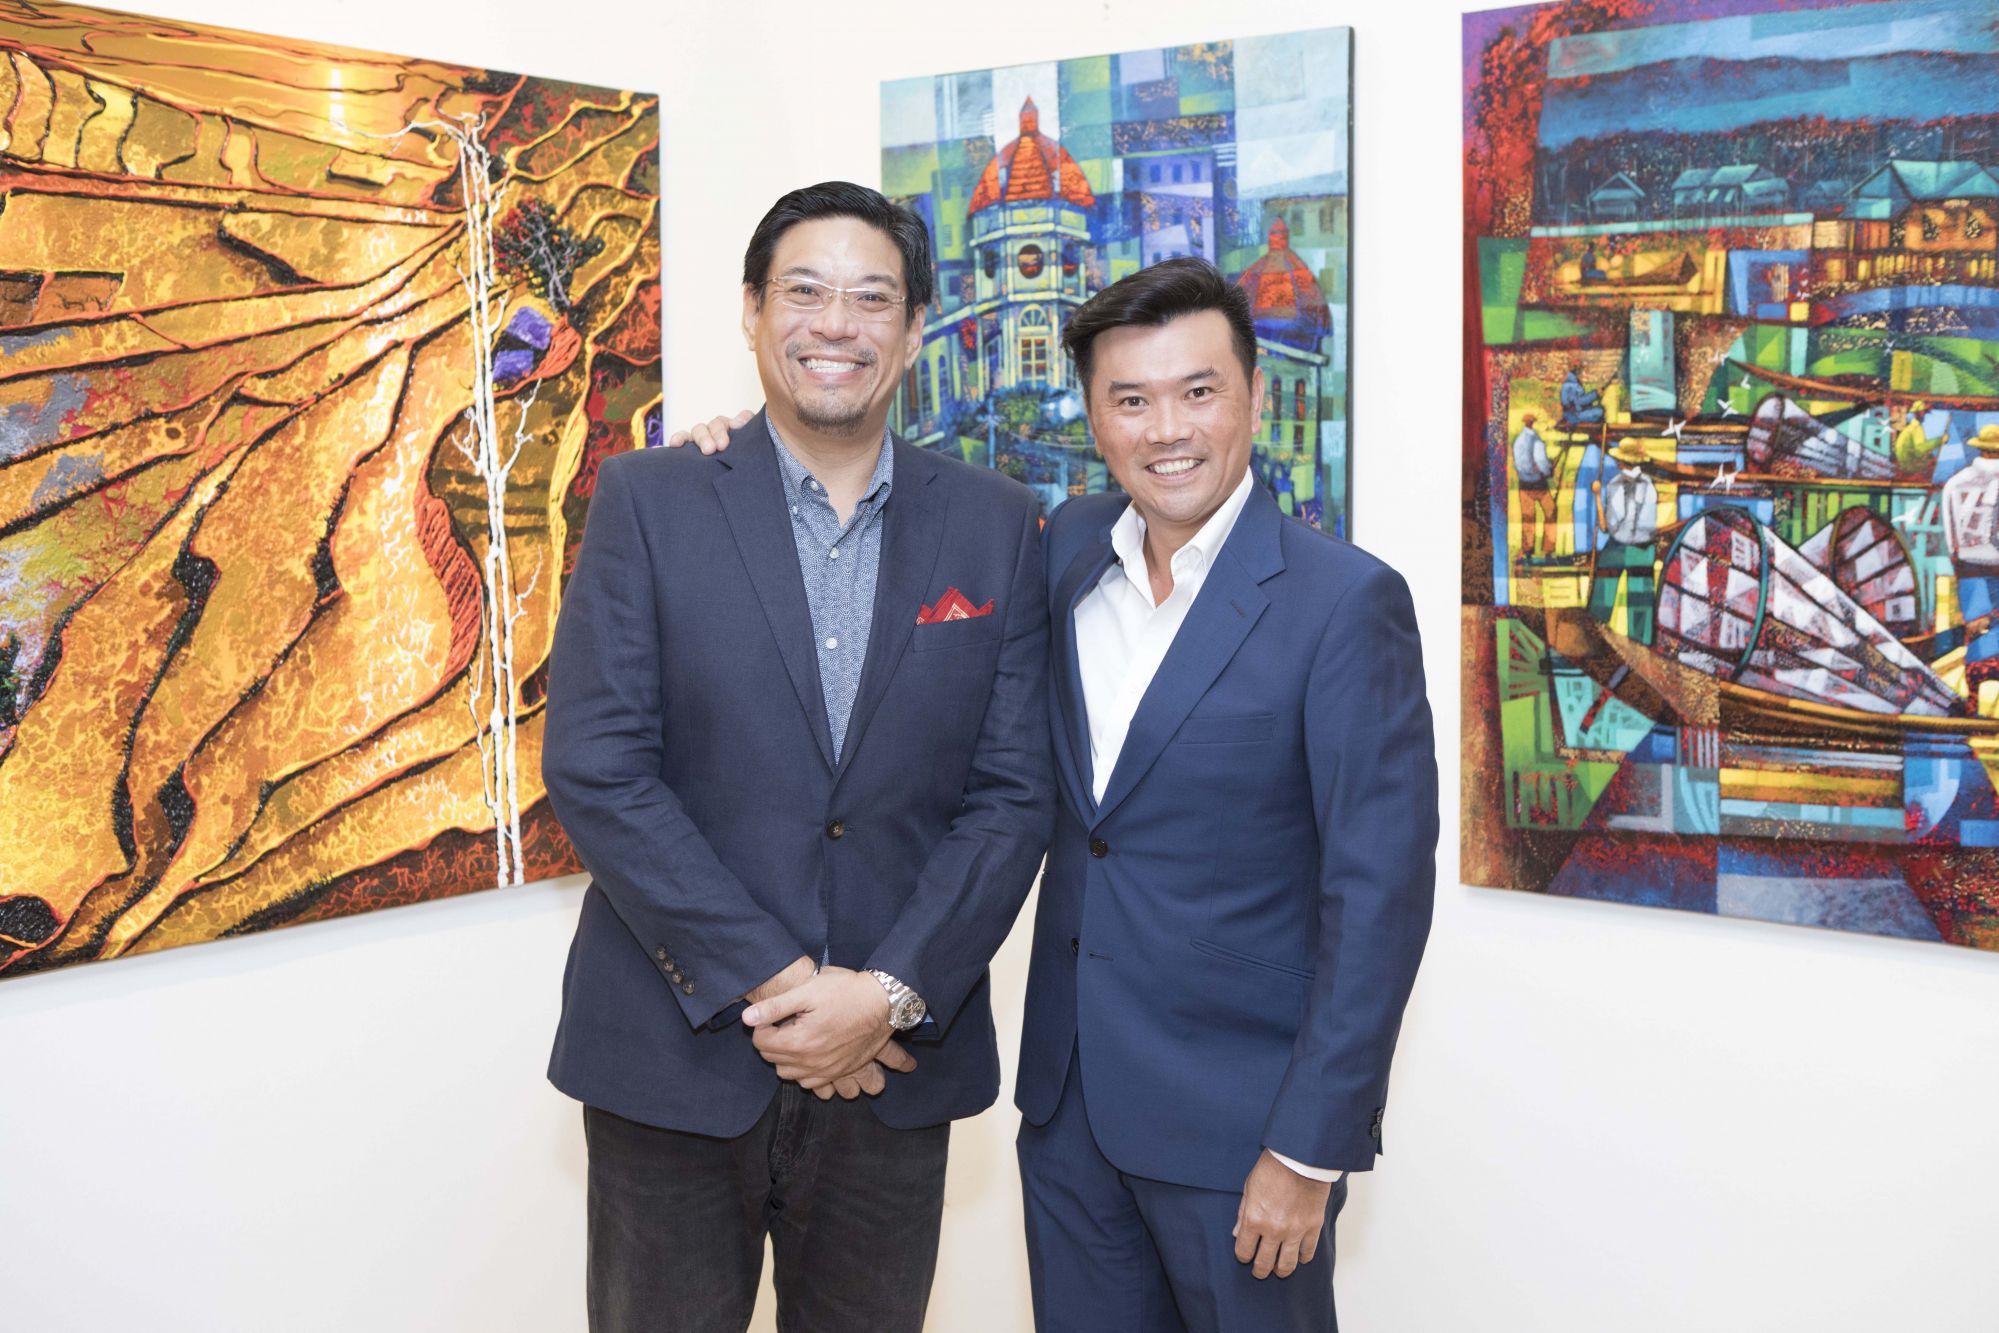 Danny Tan, Gerald Lee